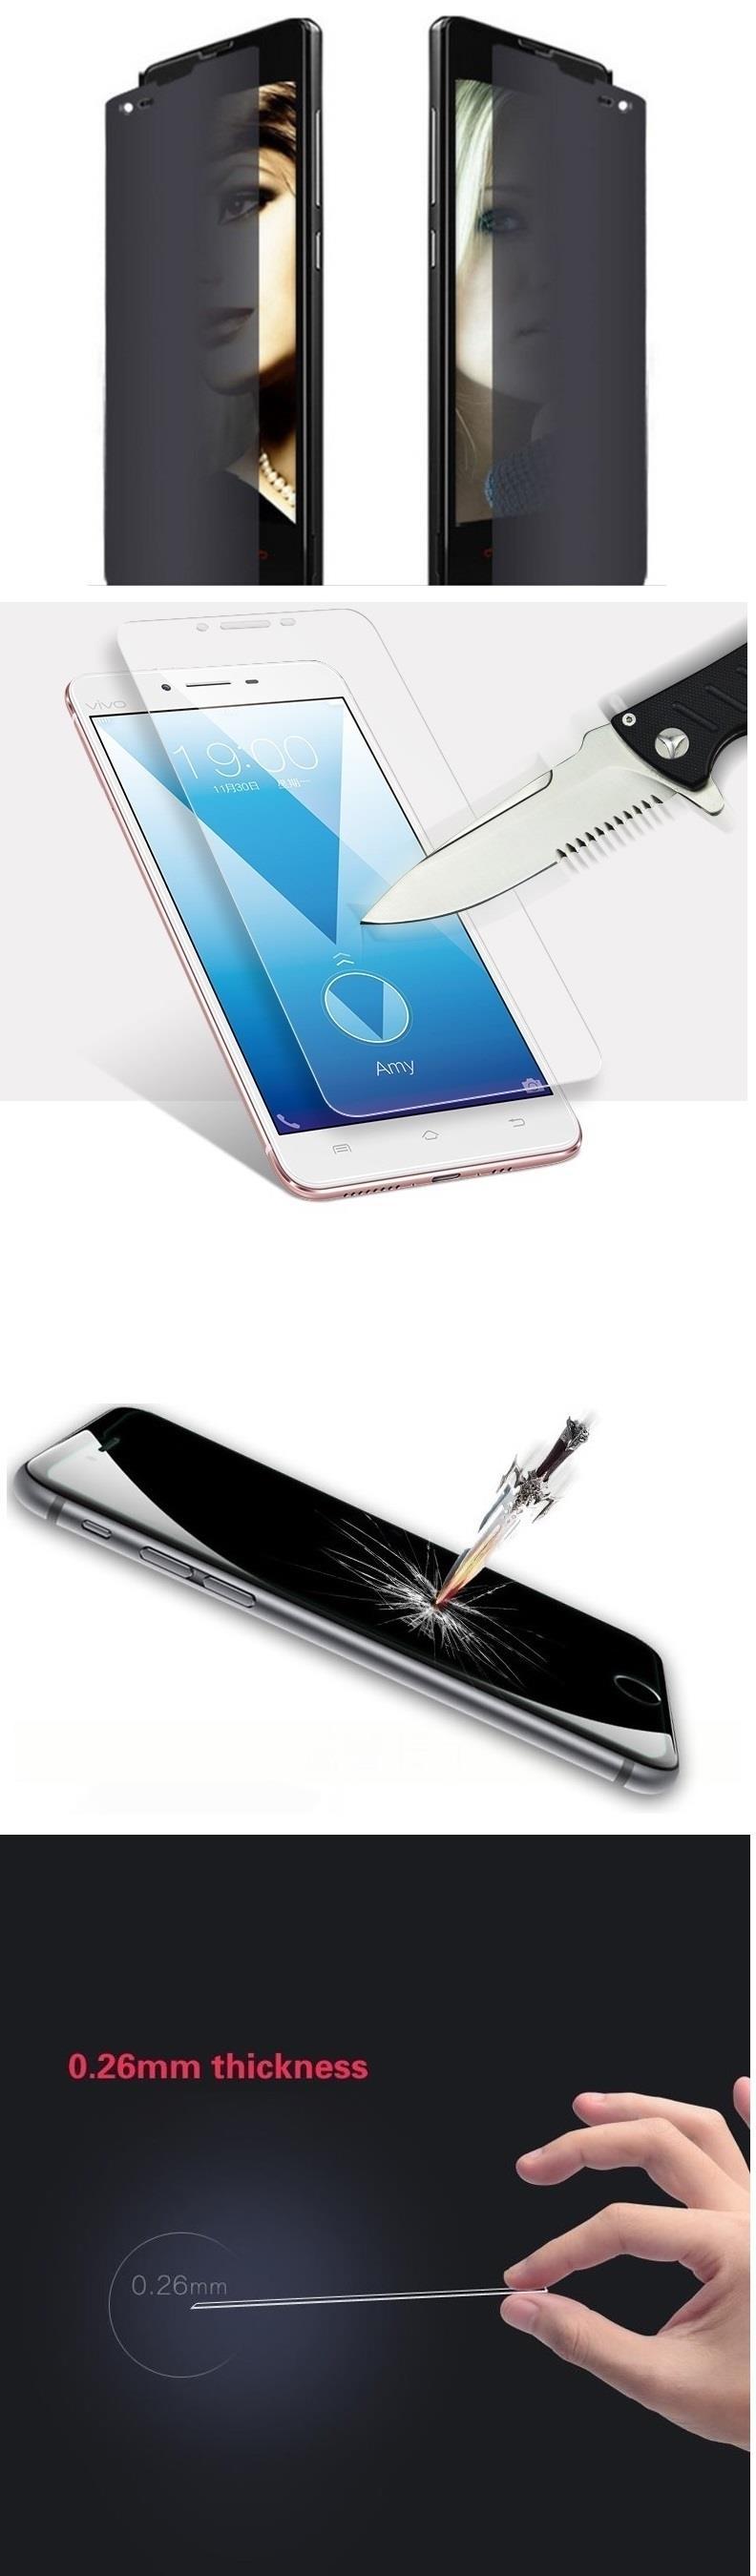 Samsung Galaxy E5 Premium Privacy Te End 4 13 2019 215 Pm Tempered Glass 026mm 9h